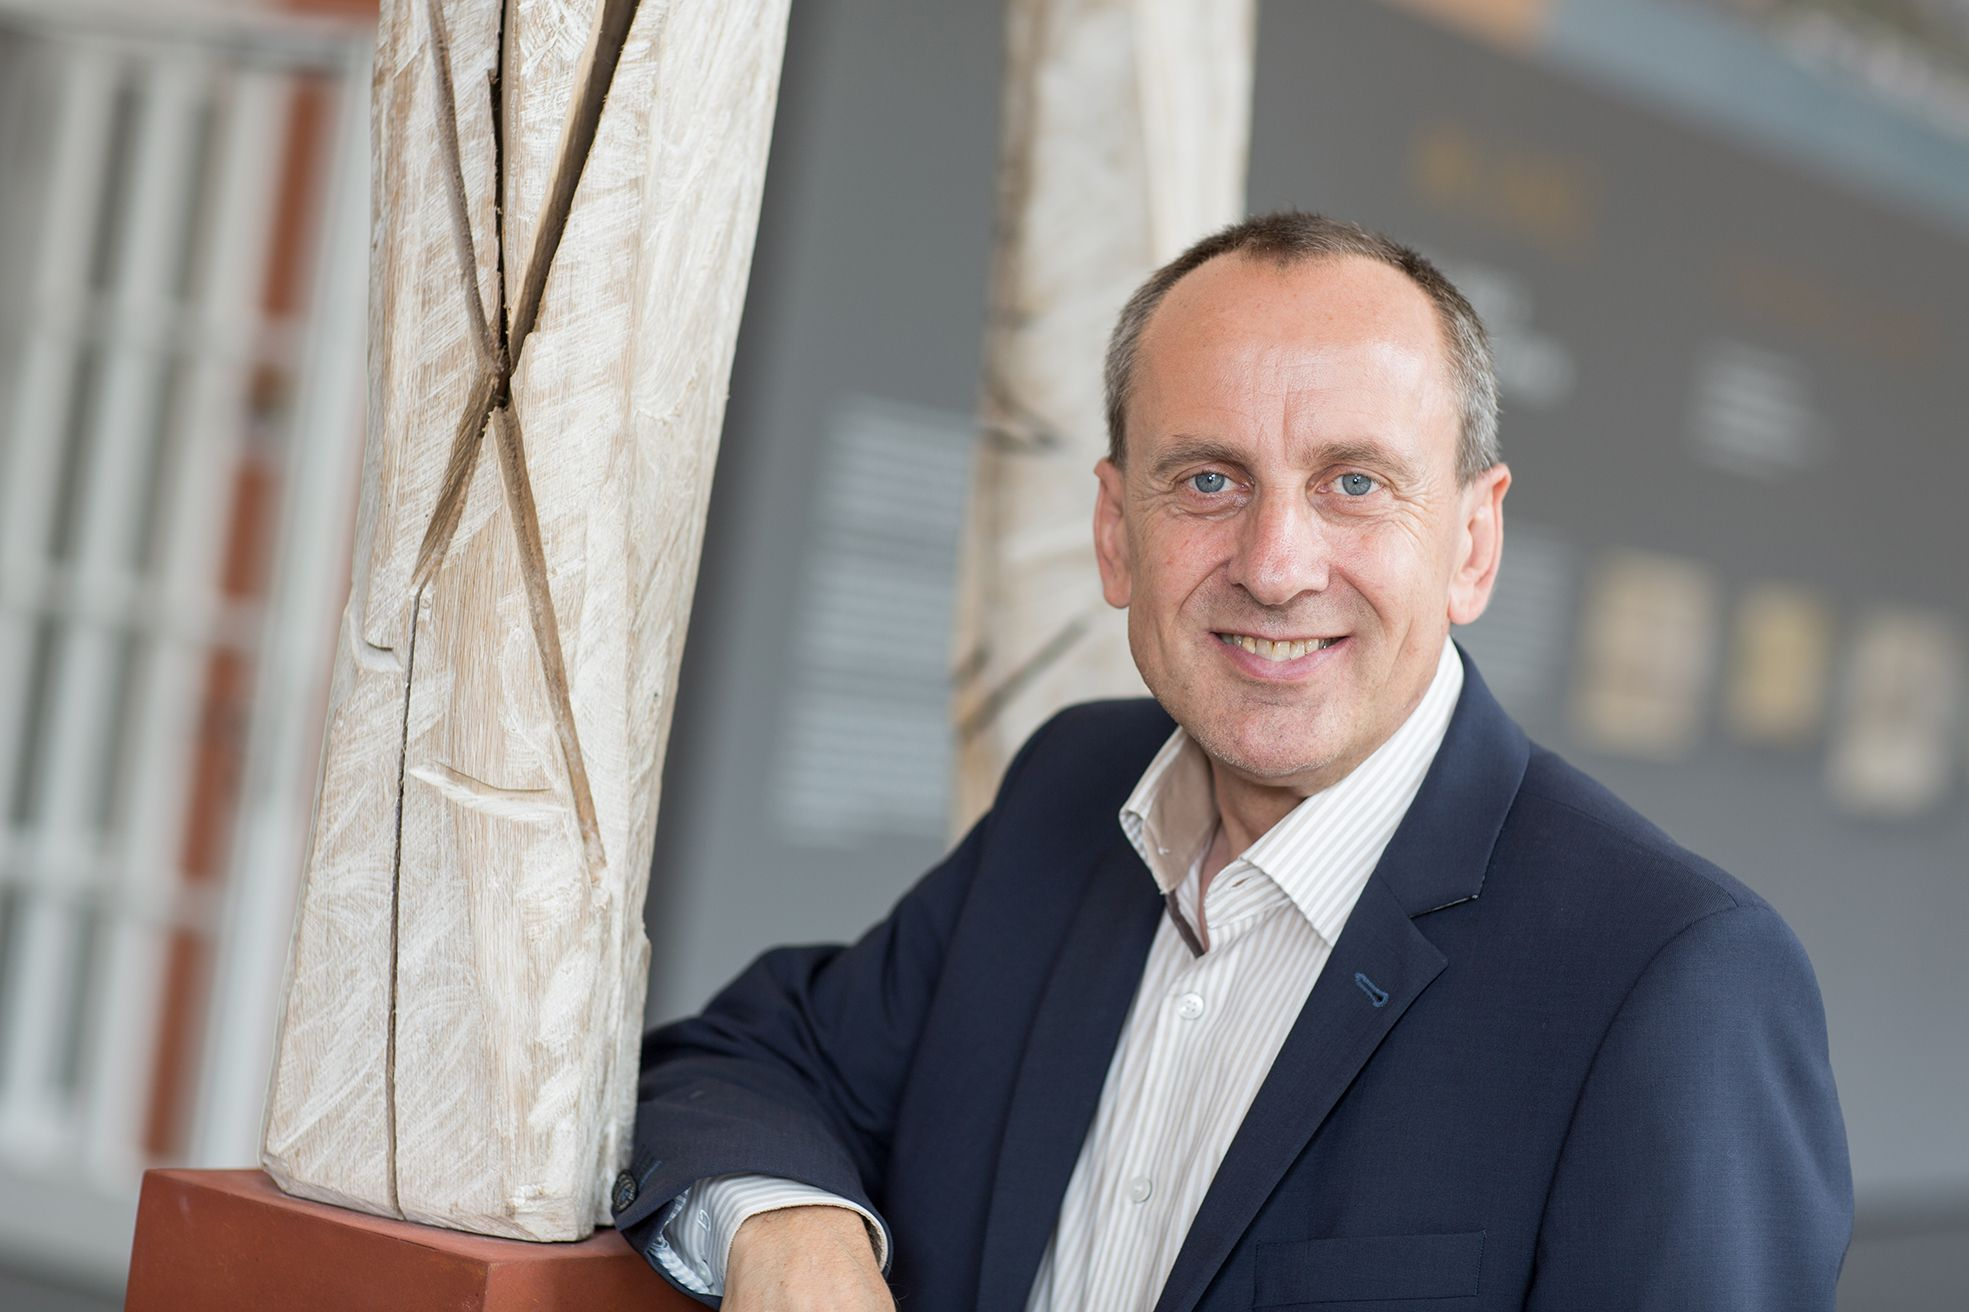 Prof. Dr. Konrad Wolf